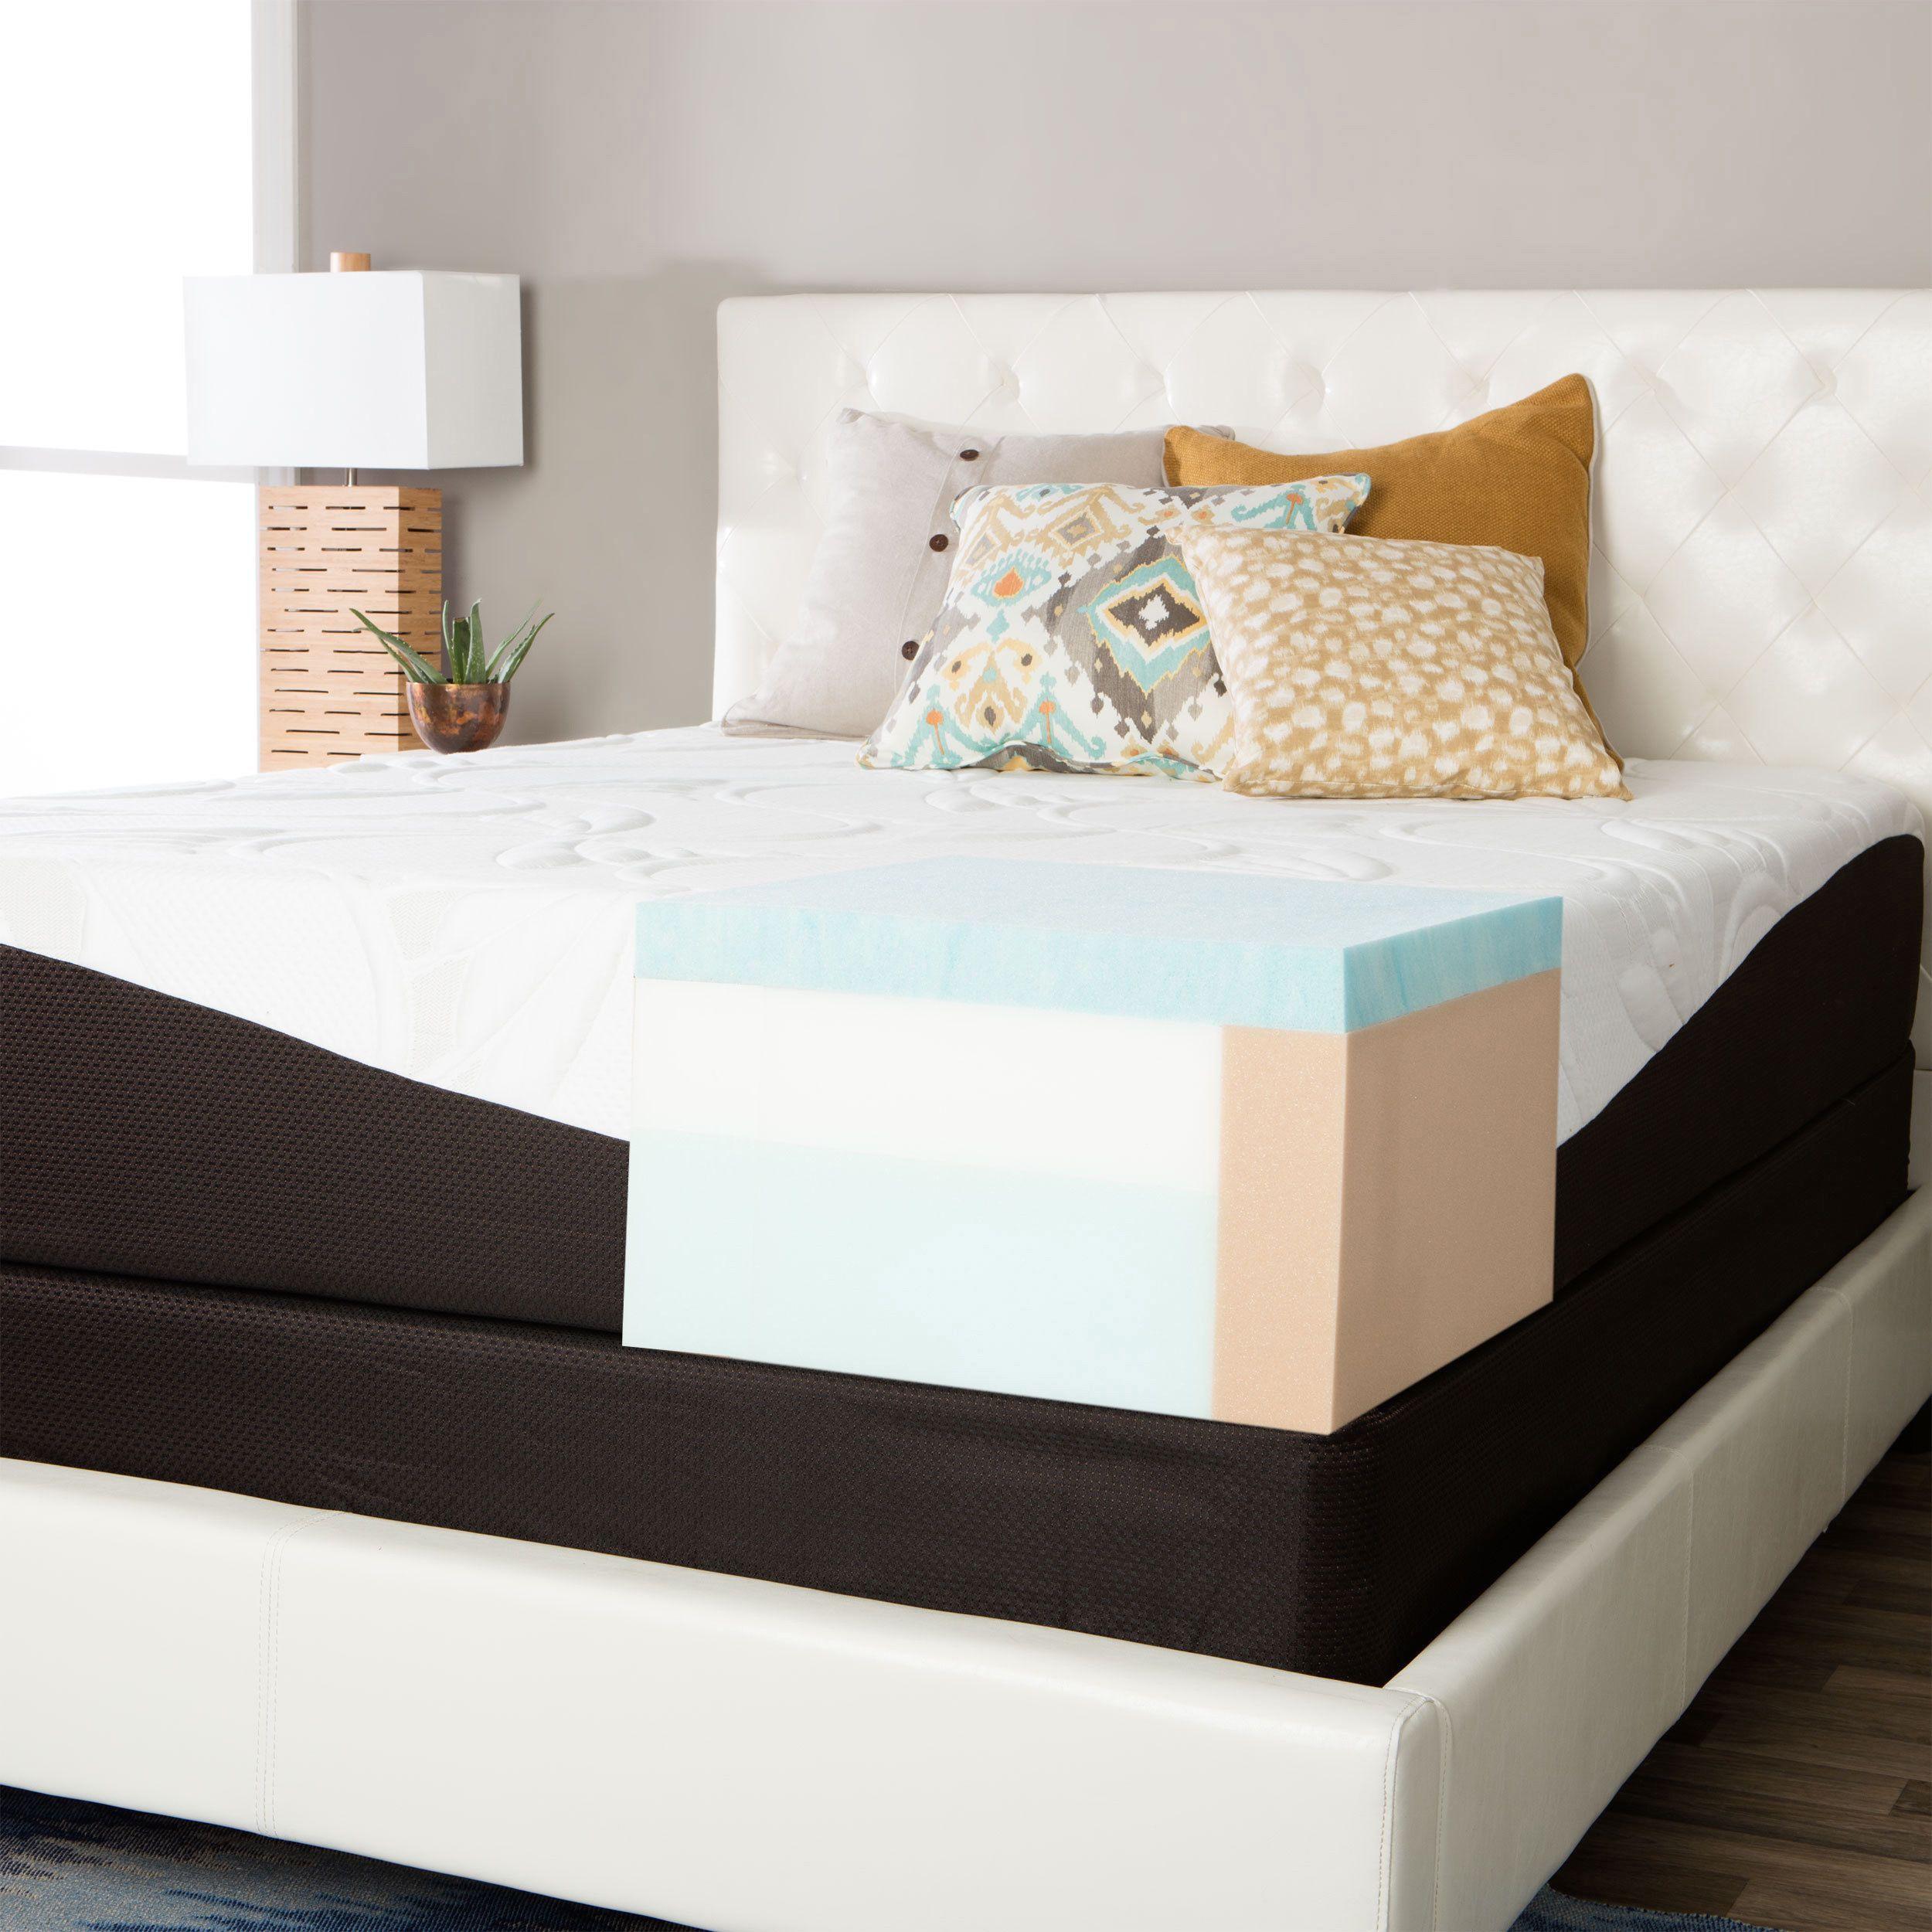 Comforpedic From Beautyrest Choose Your Comfort 12 Inch Gel Memory